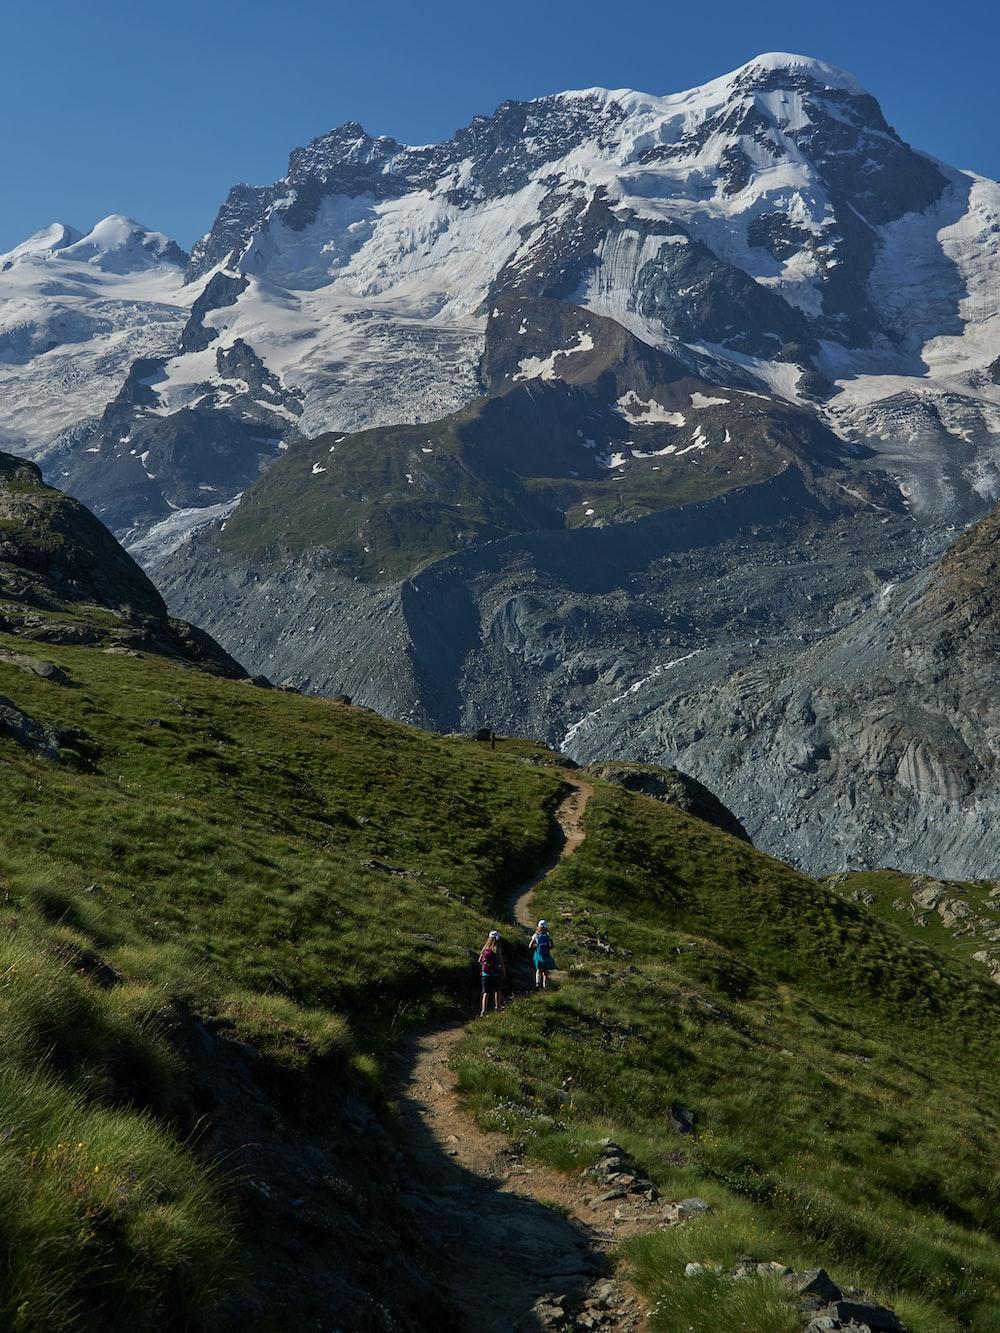 people walking on mountain